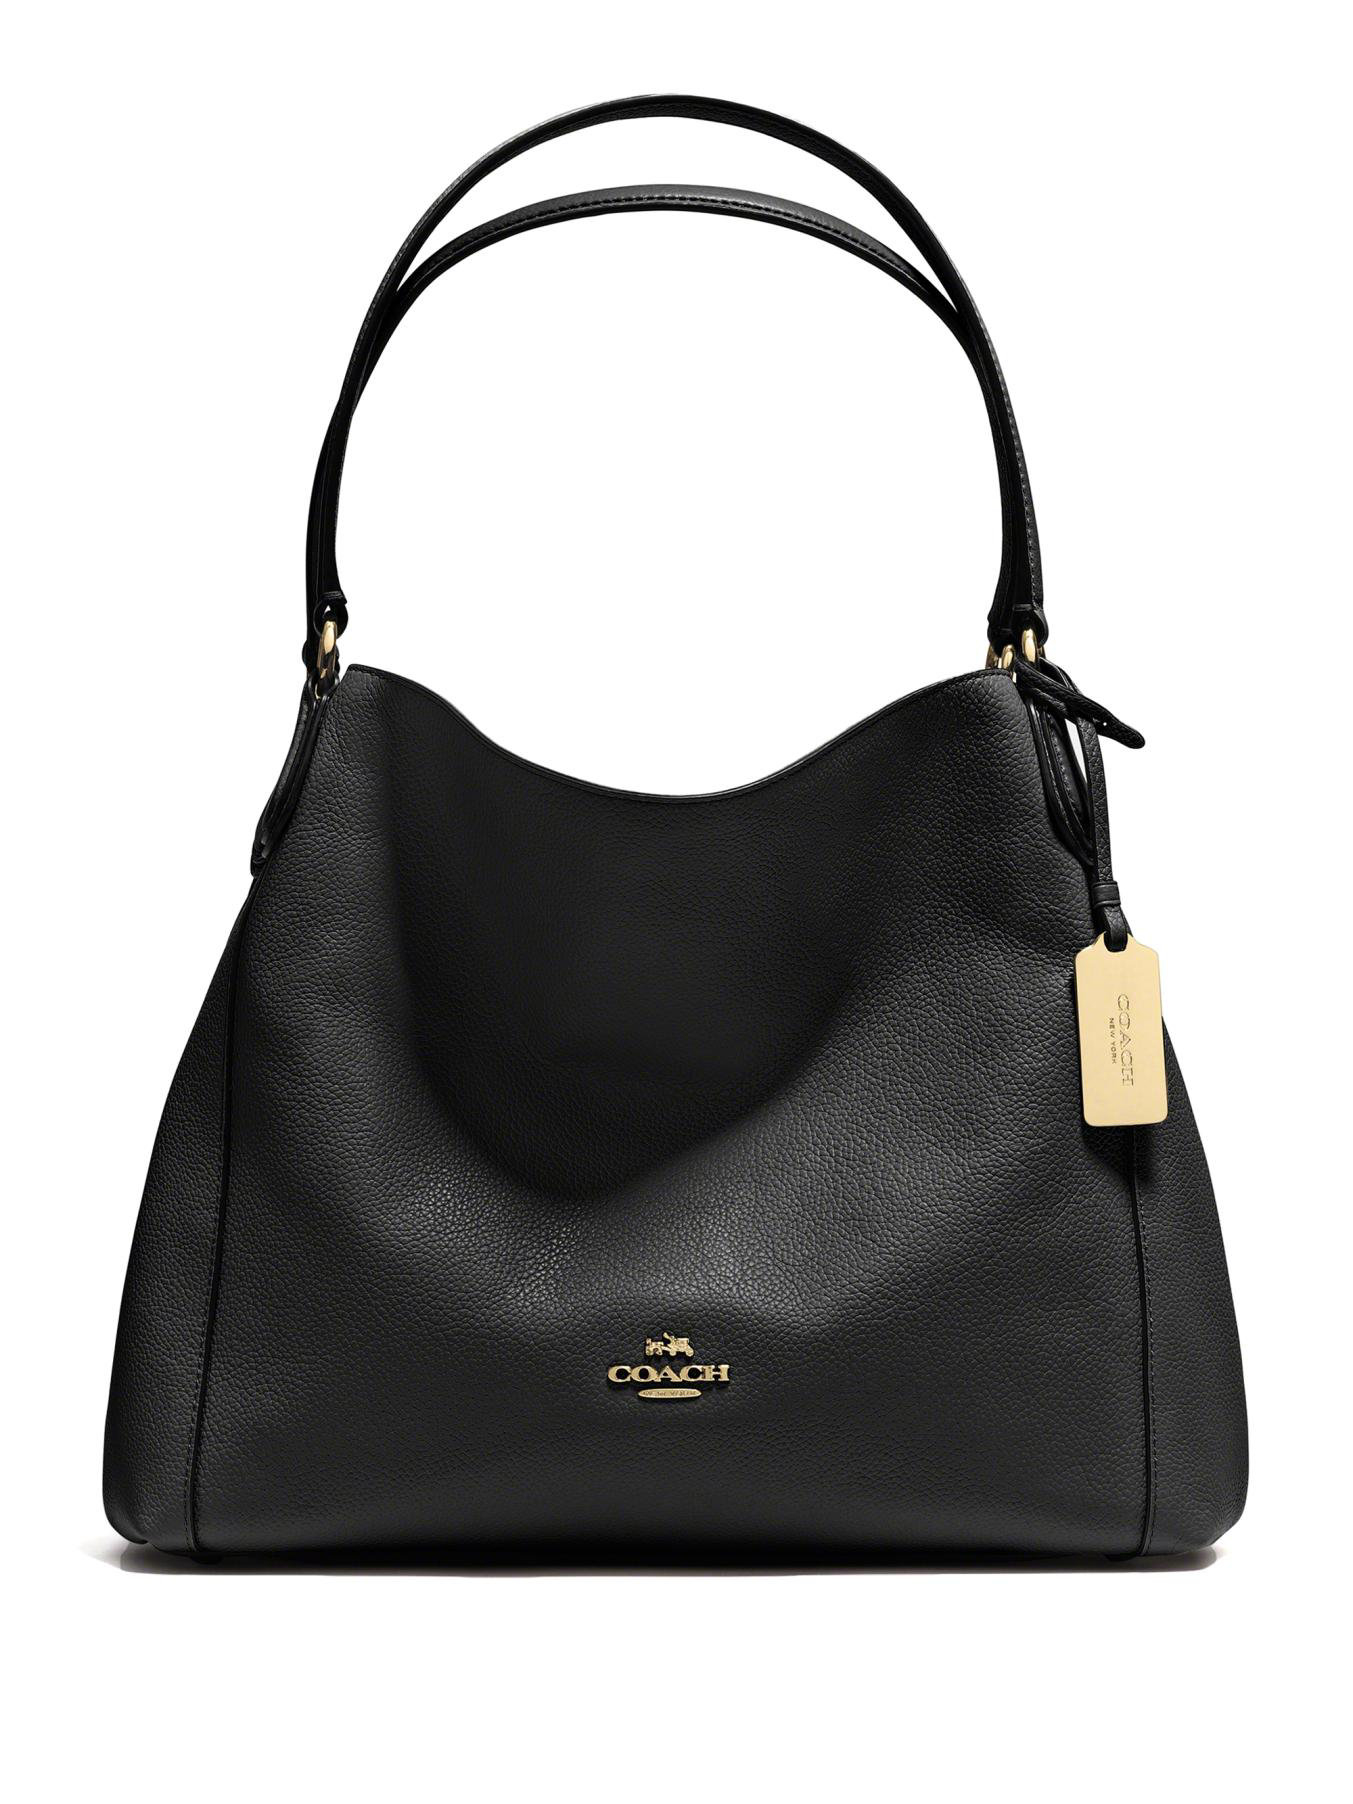 Coach Edie Pebbled Leather Shoulder Bag in Black | Lyst